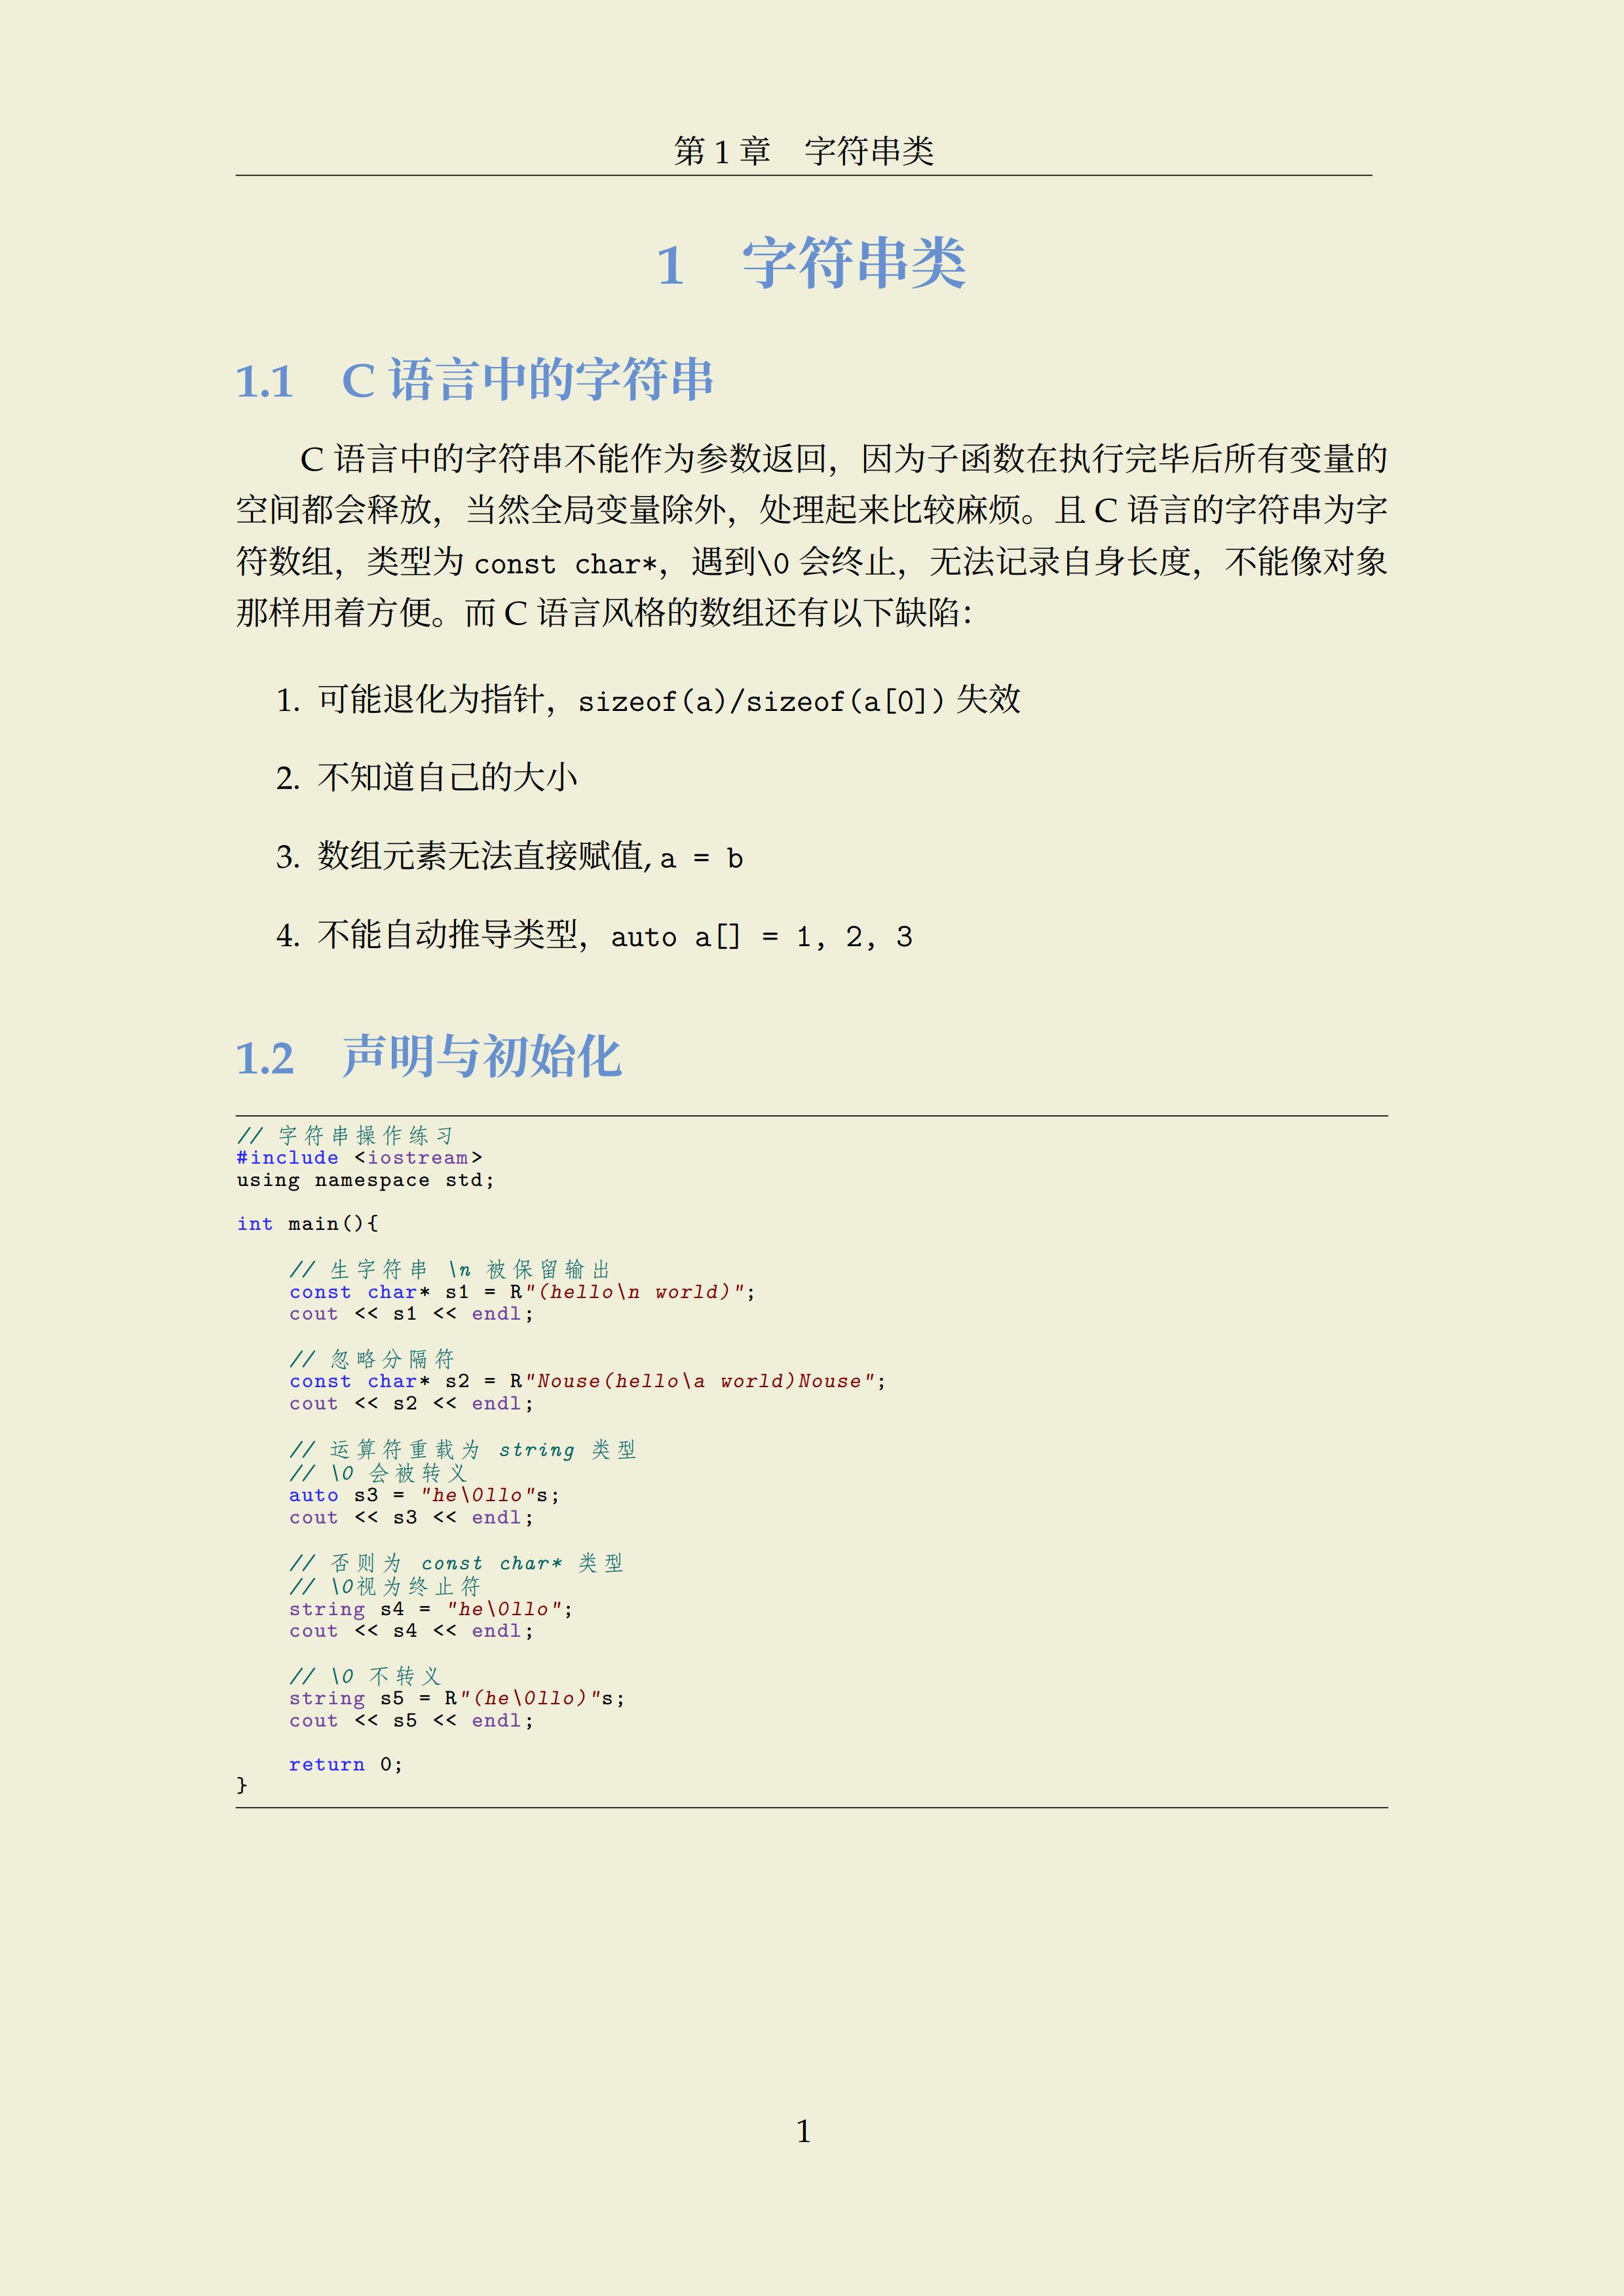 LaTeX 制作数据结构与算法笔记